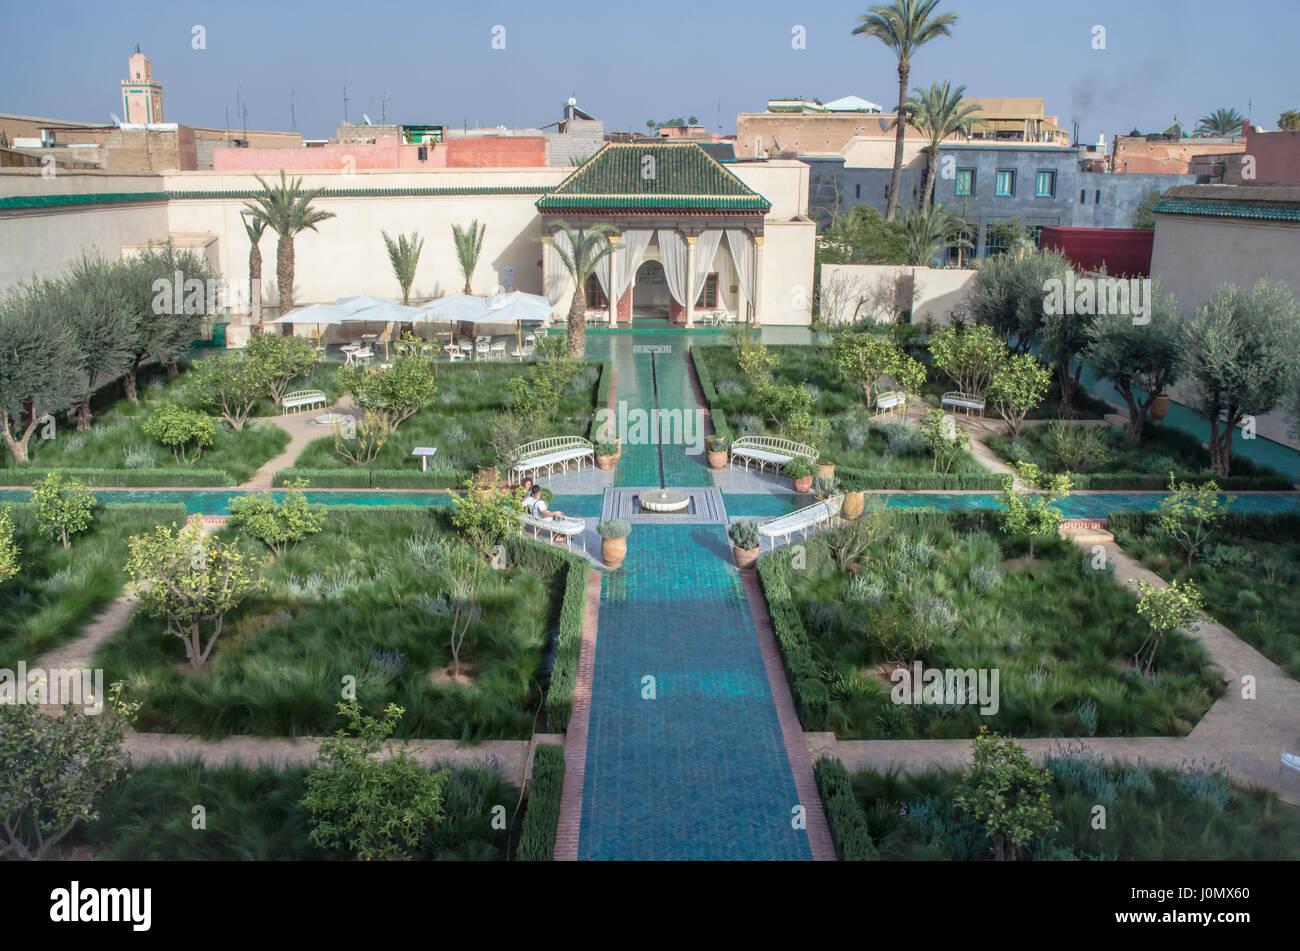 Marrakech giardino segreto giardino islamico layout Immagini Stock